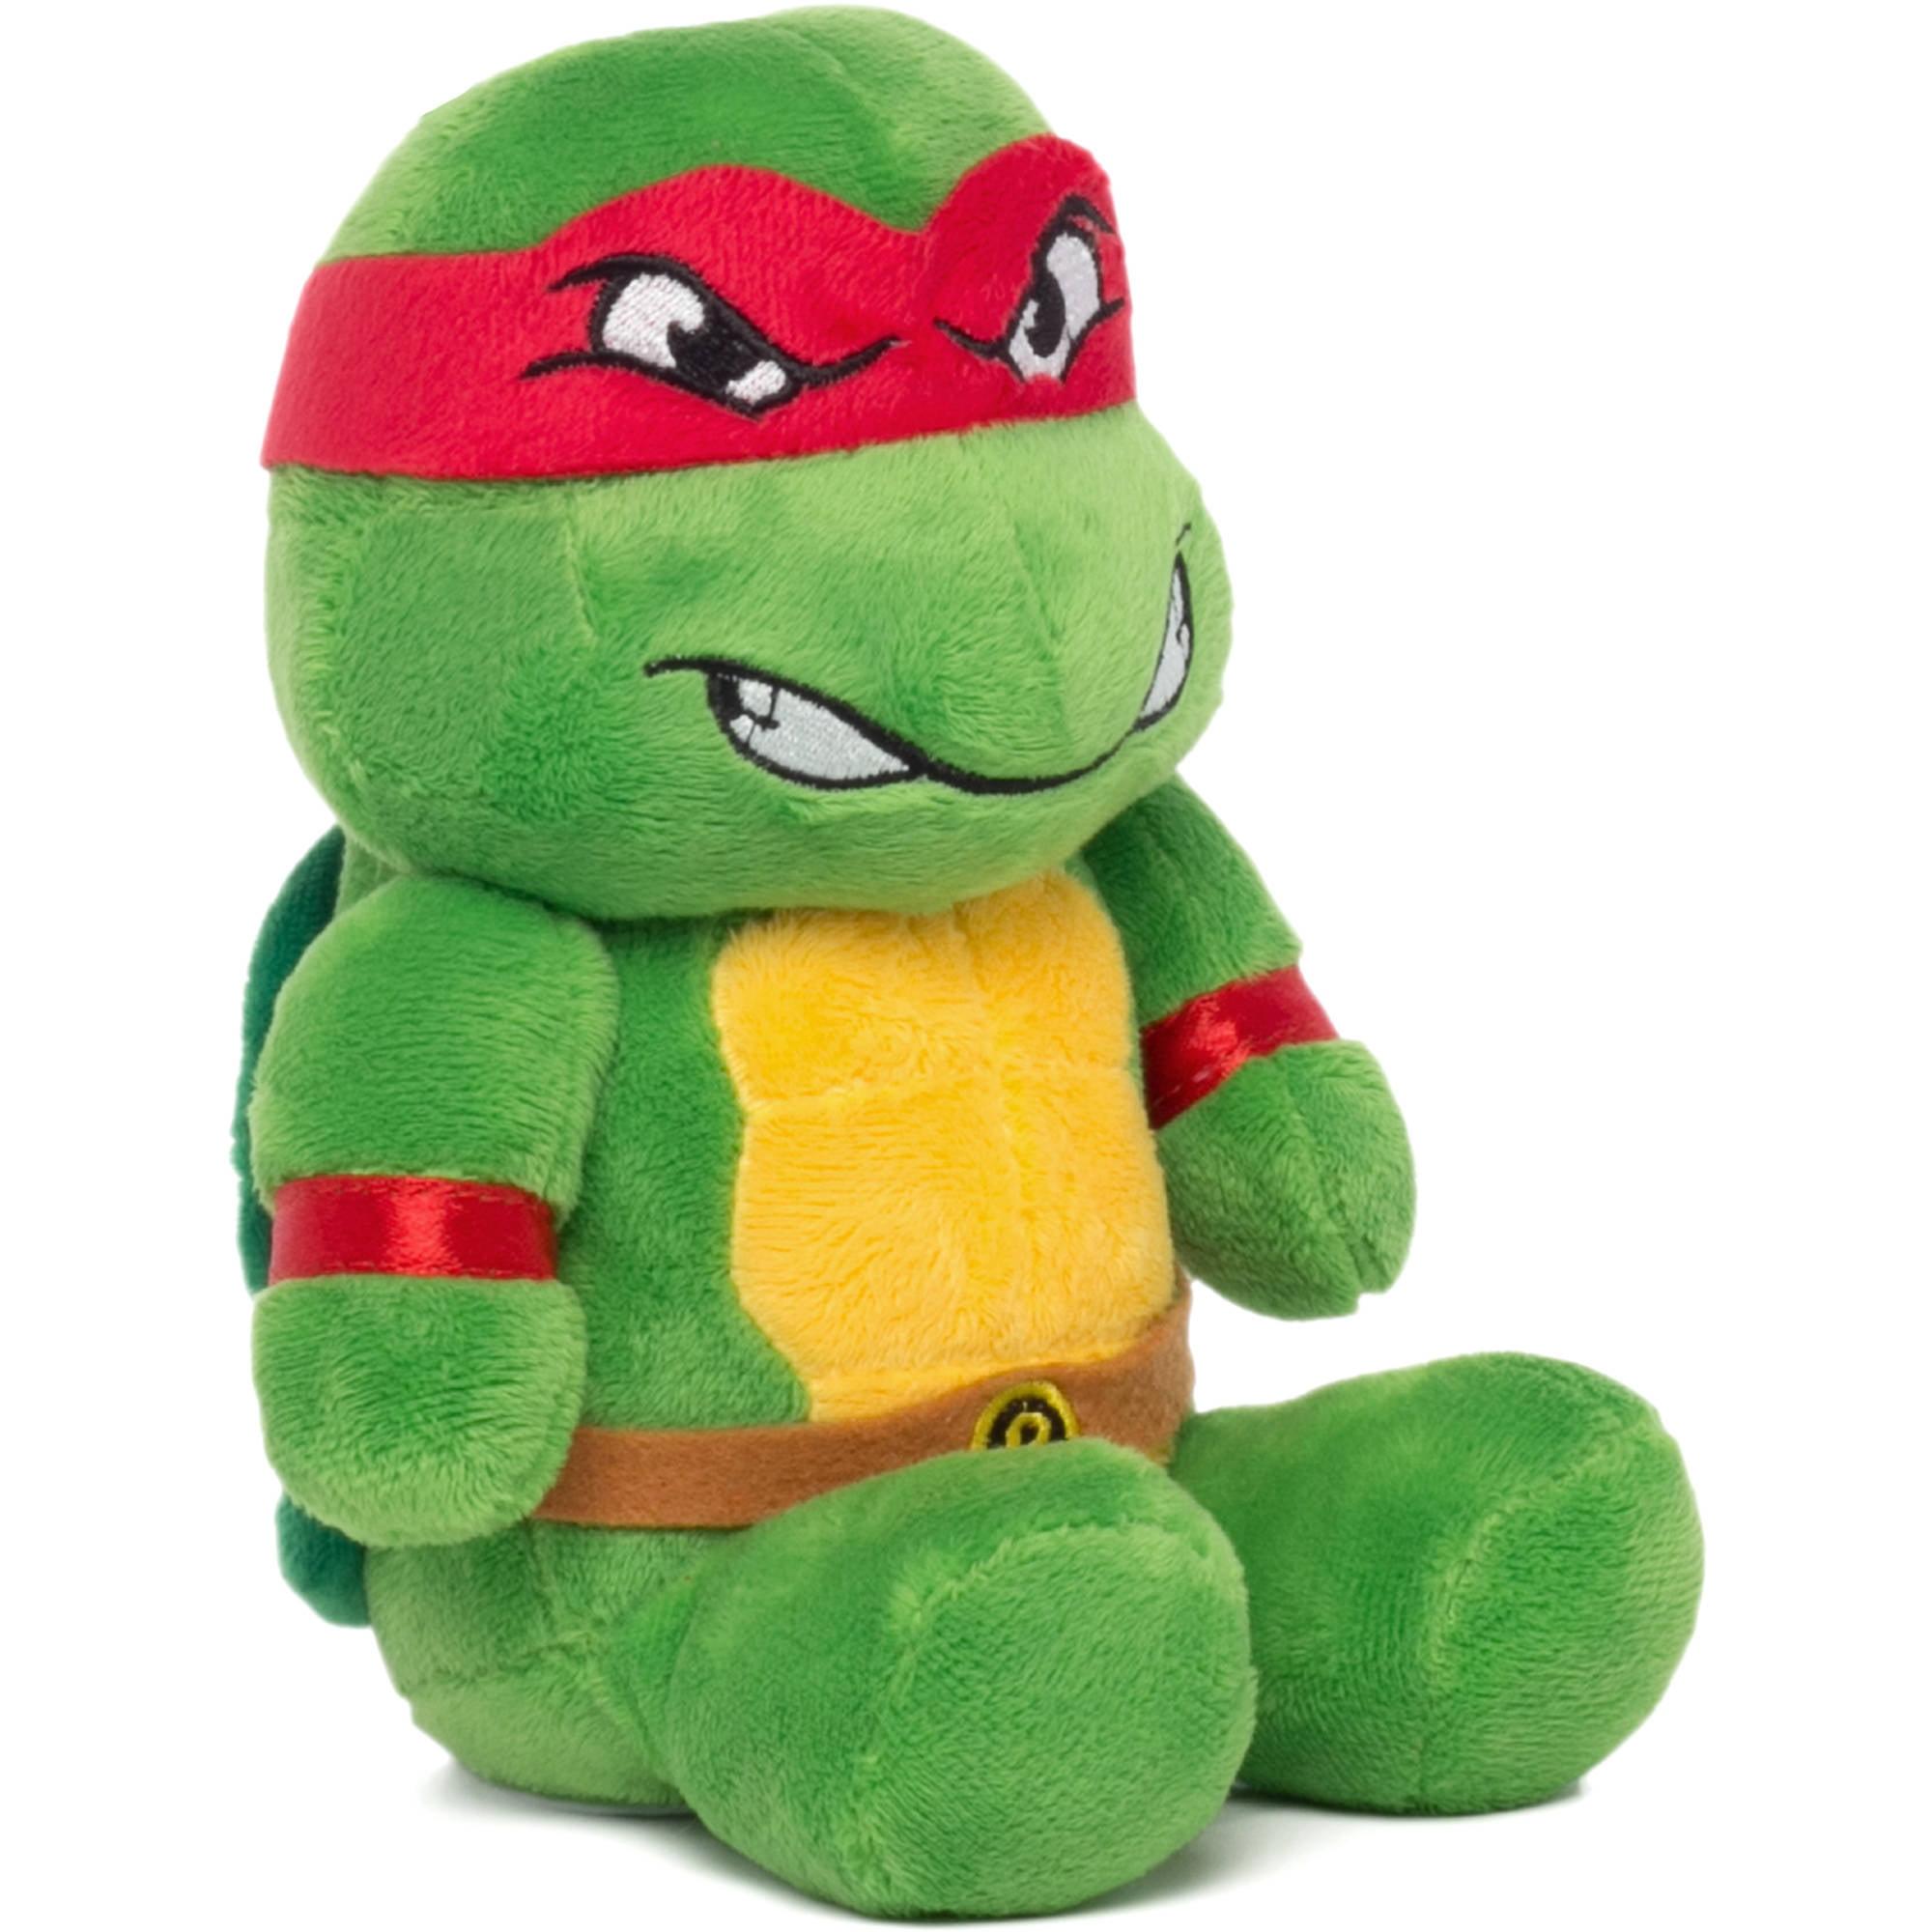 Teenage Mutant Ninja Turtle Plush Piggy Bank Walmart Inventory